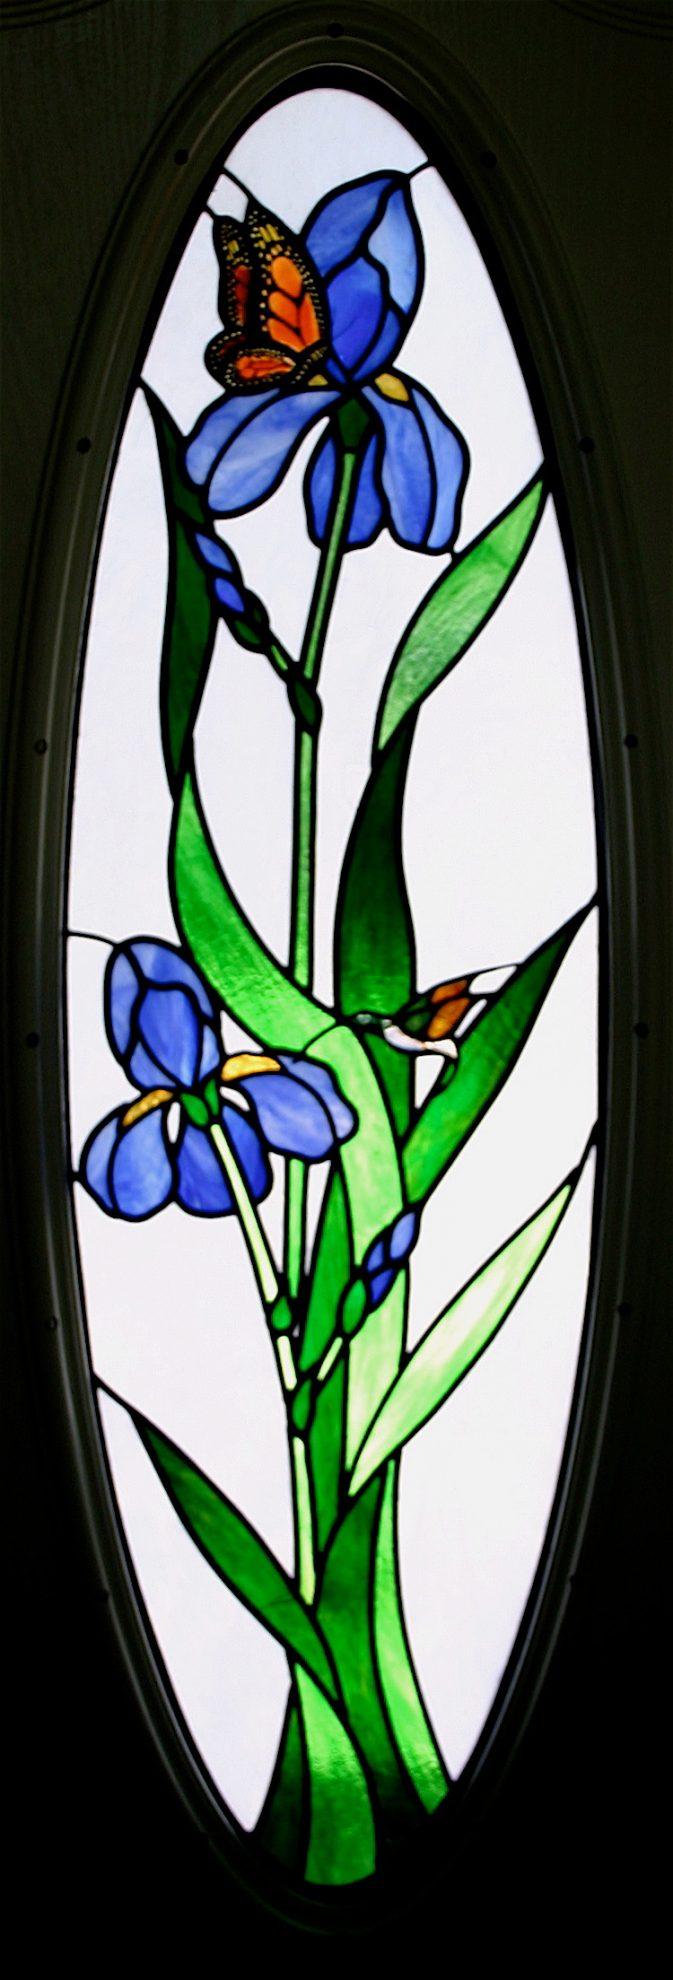 6.1.iris.monarch.oval